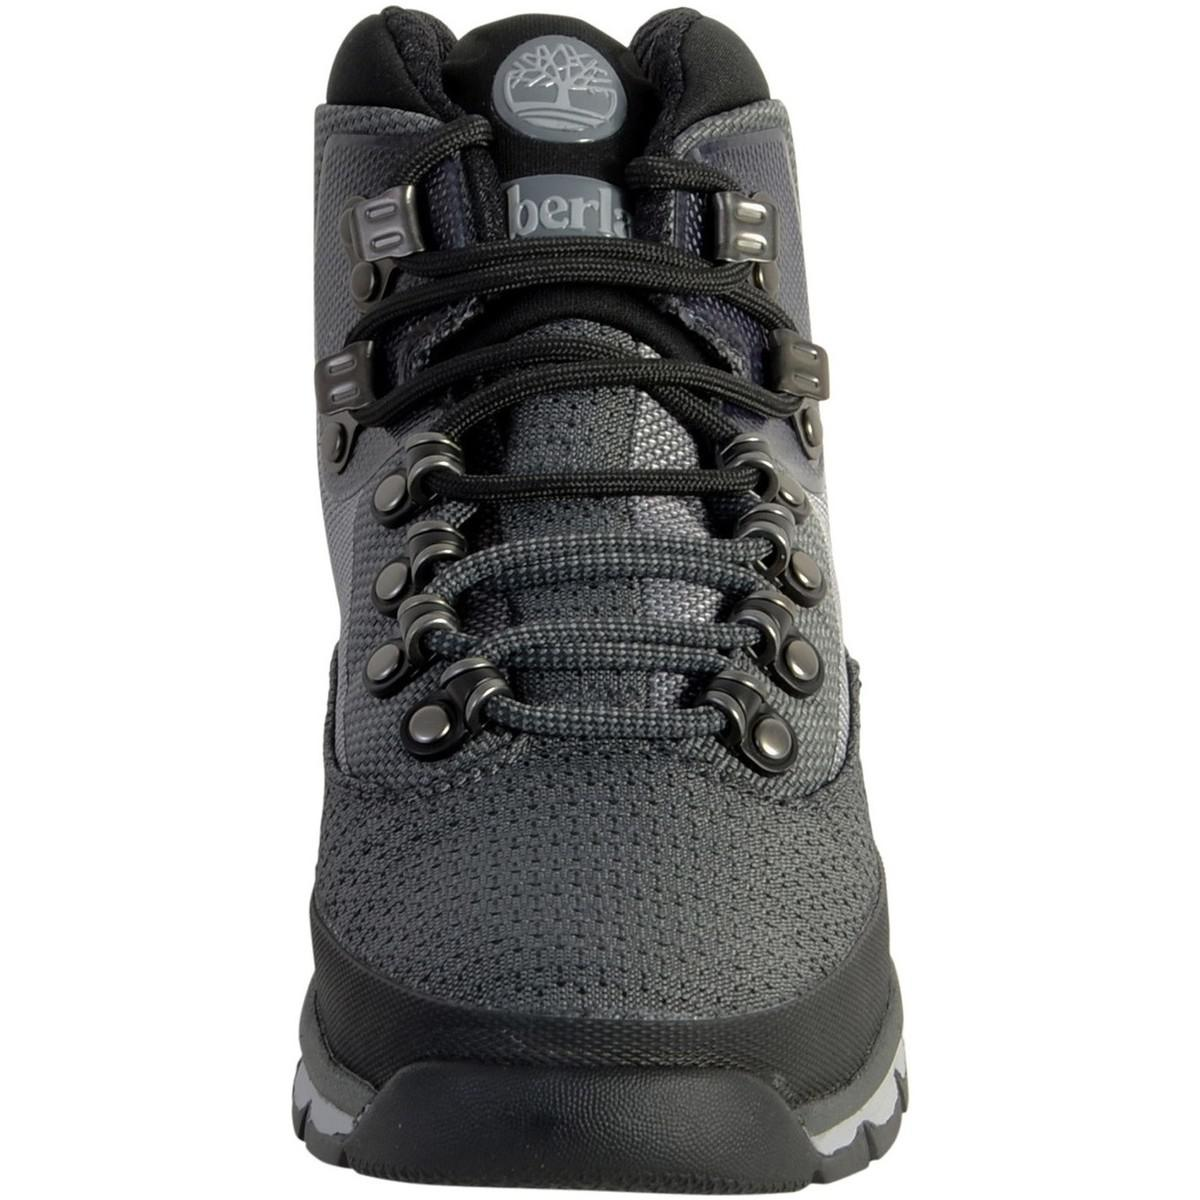 e788319aef7 Timberland Shoes A135t Euro Hiker Jacquard Grey Men's Shoes (high ...